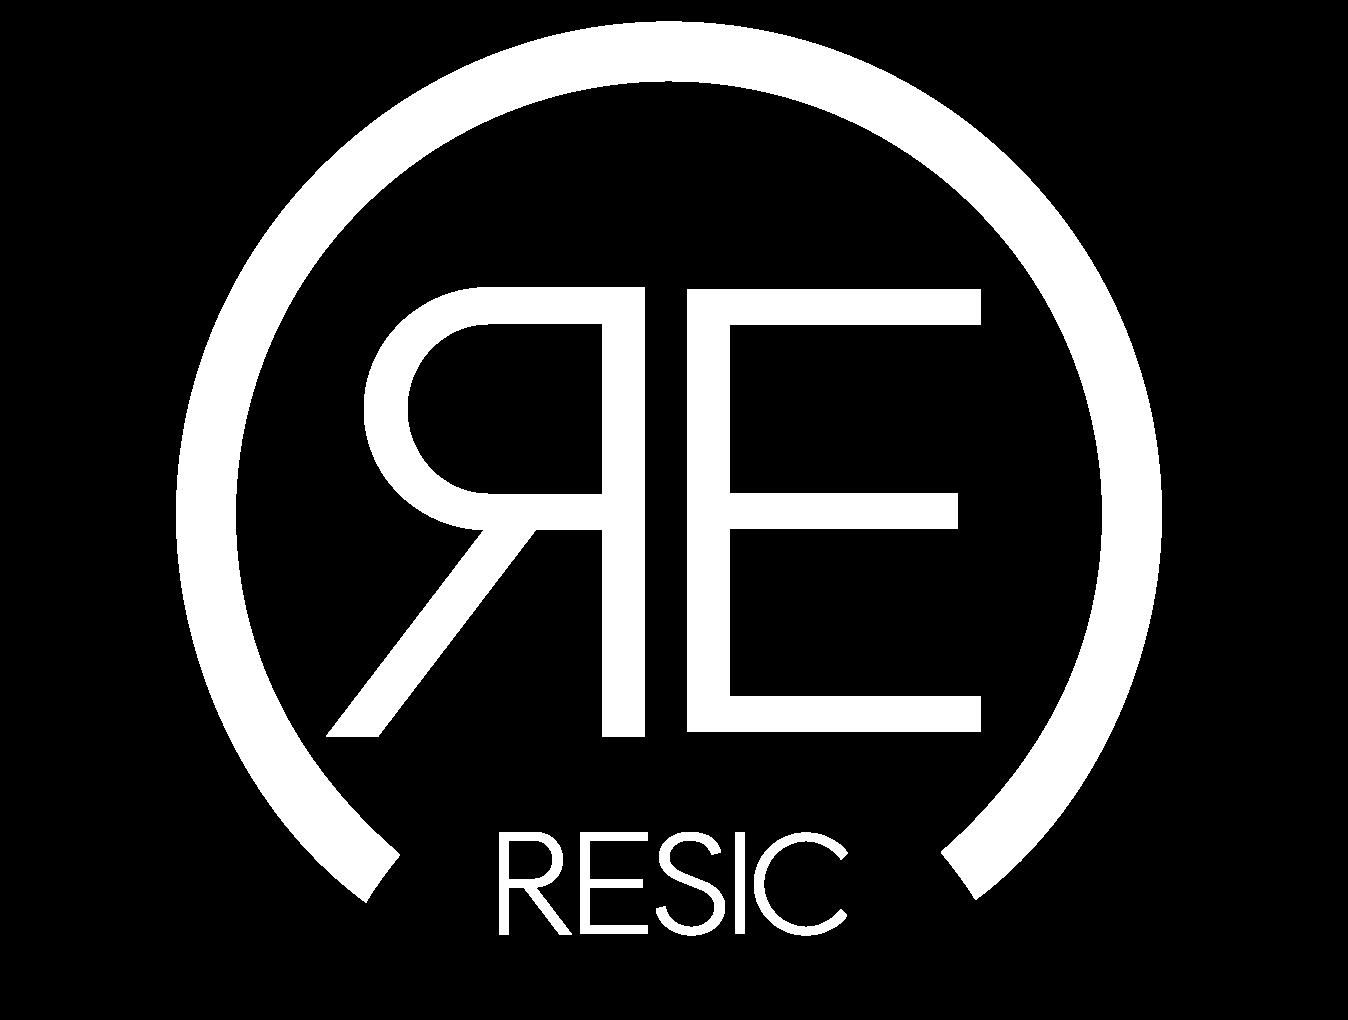 RESIC